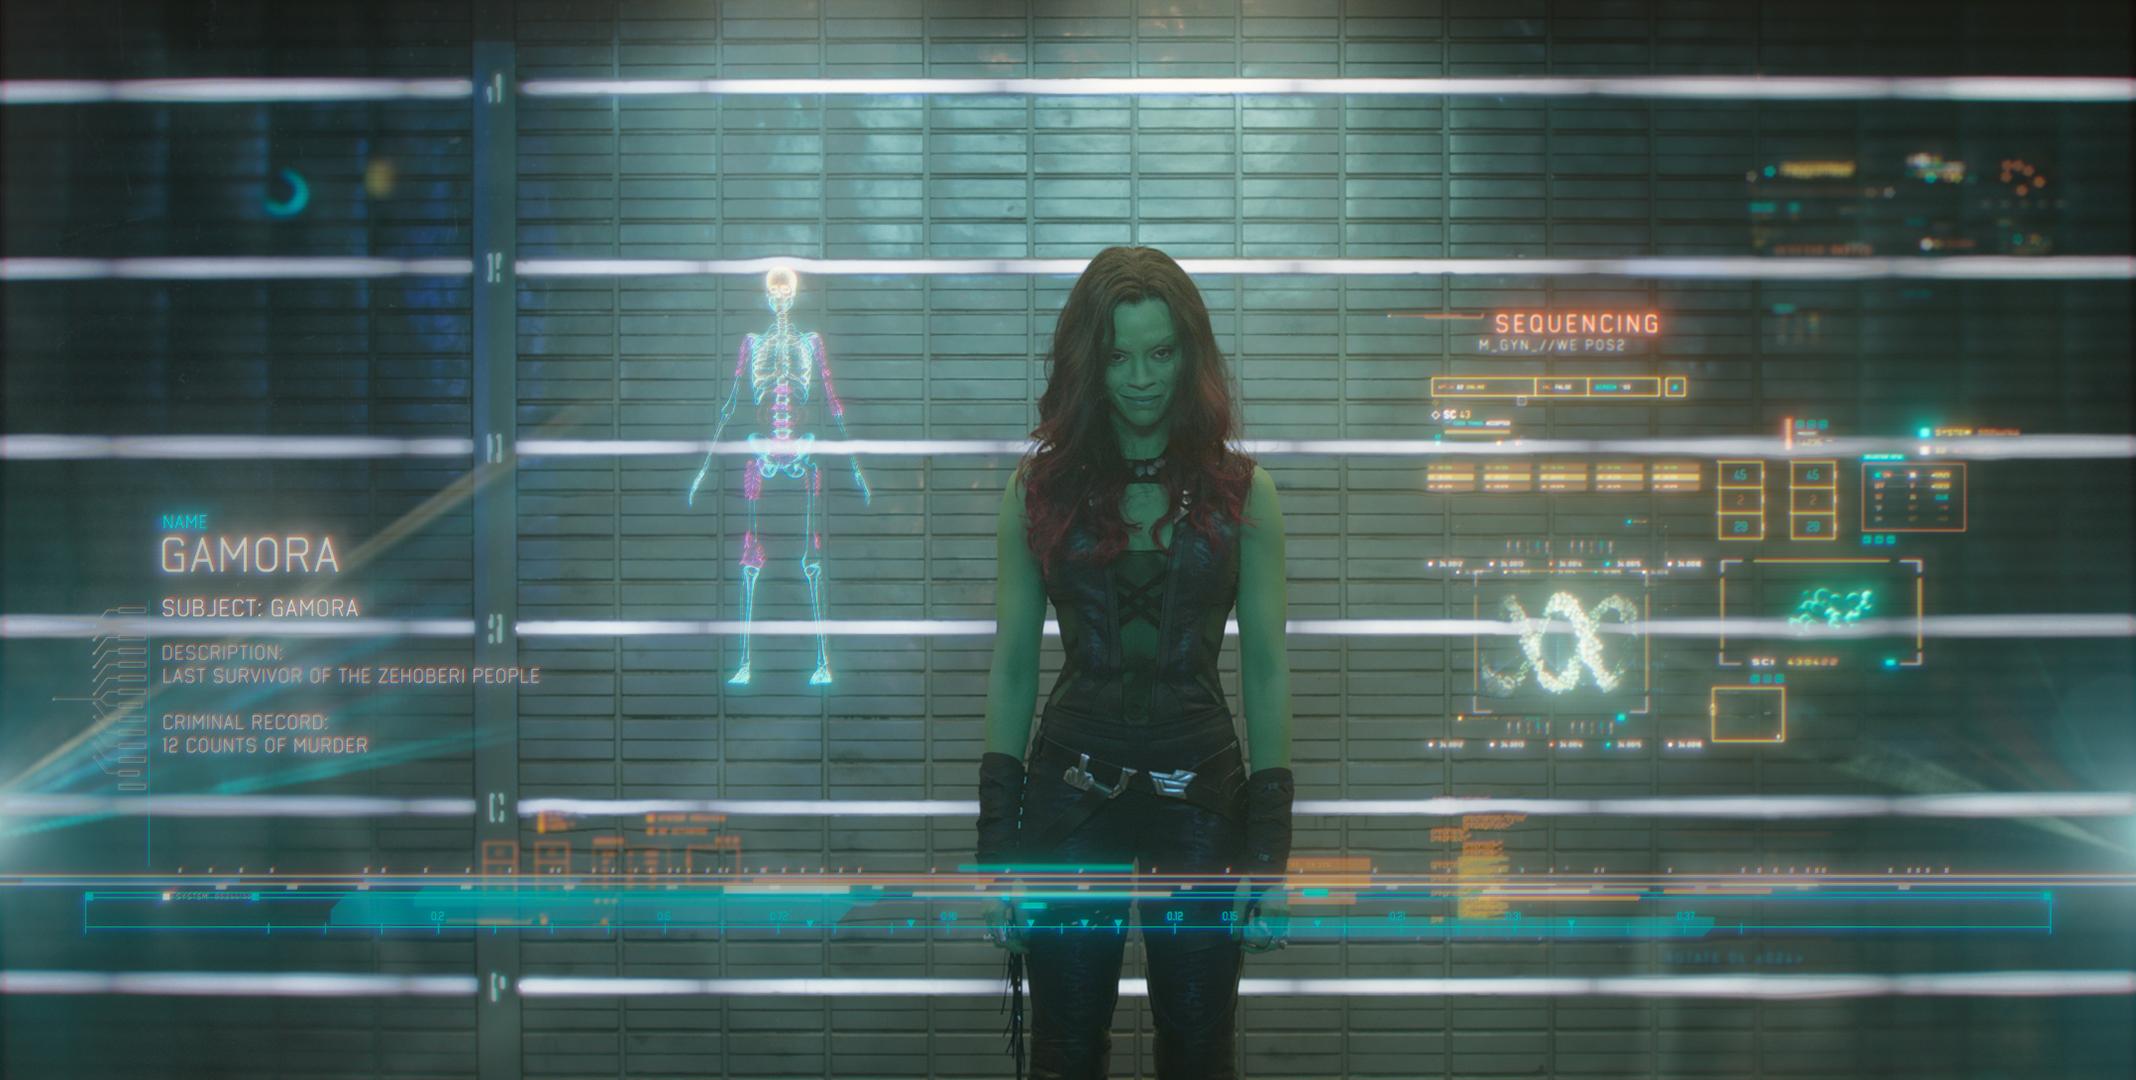 guardians-of-the-galaxy-gamora-zoe-saldana.jpg